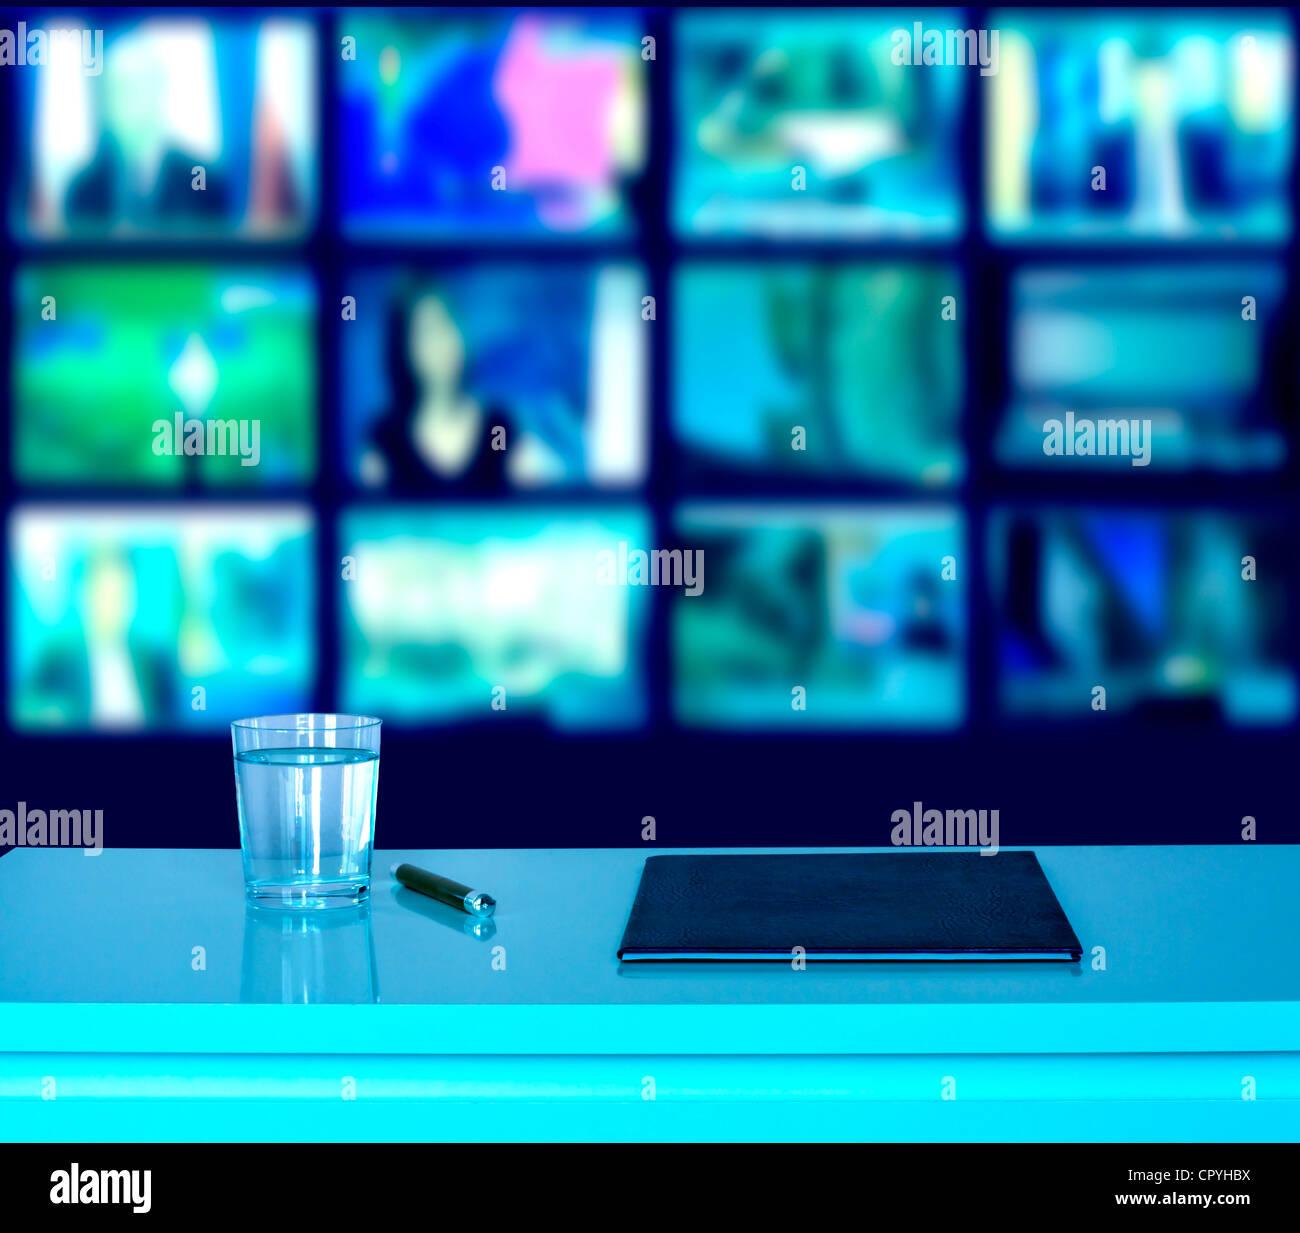 News television studio media concept background - Stock Image